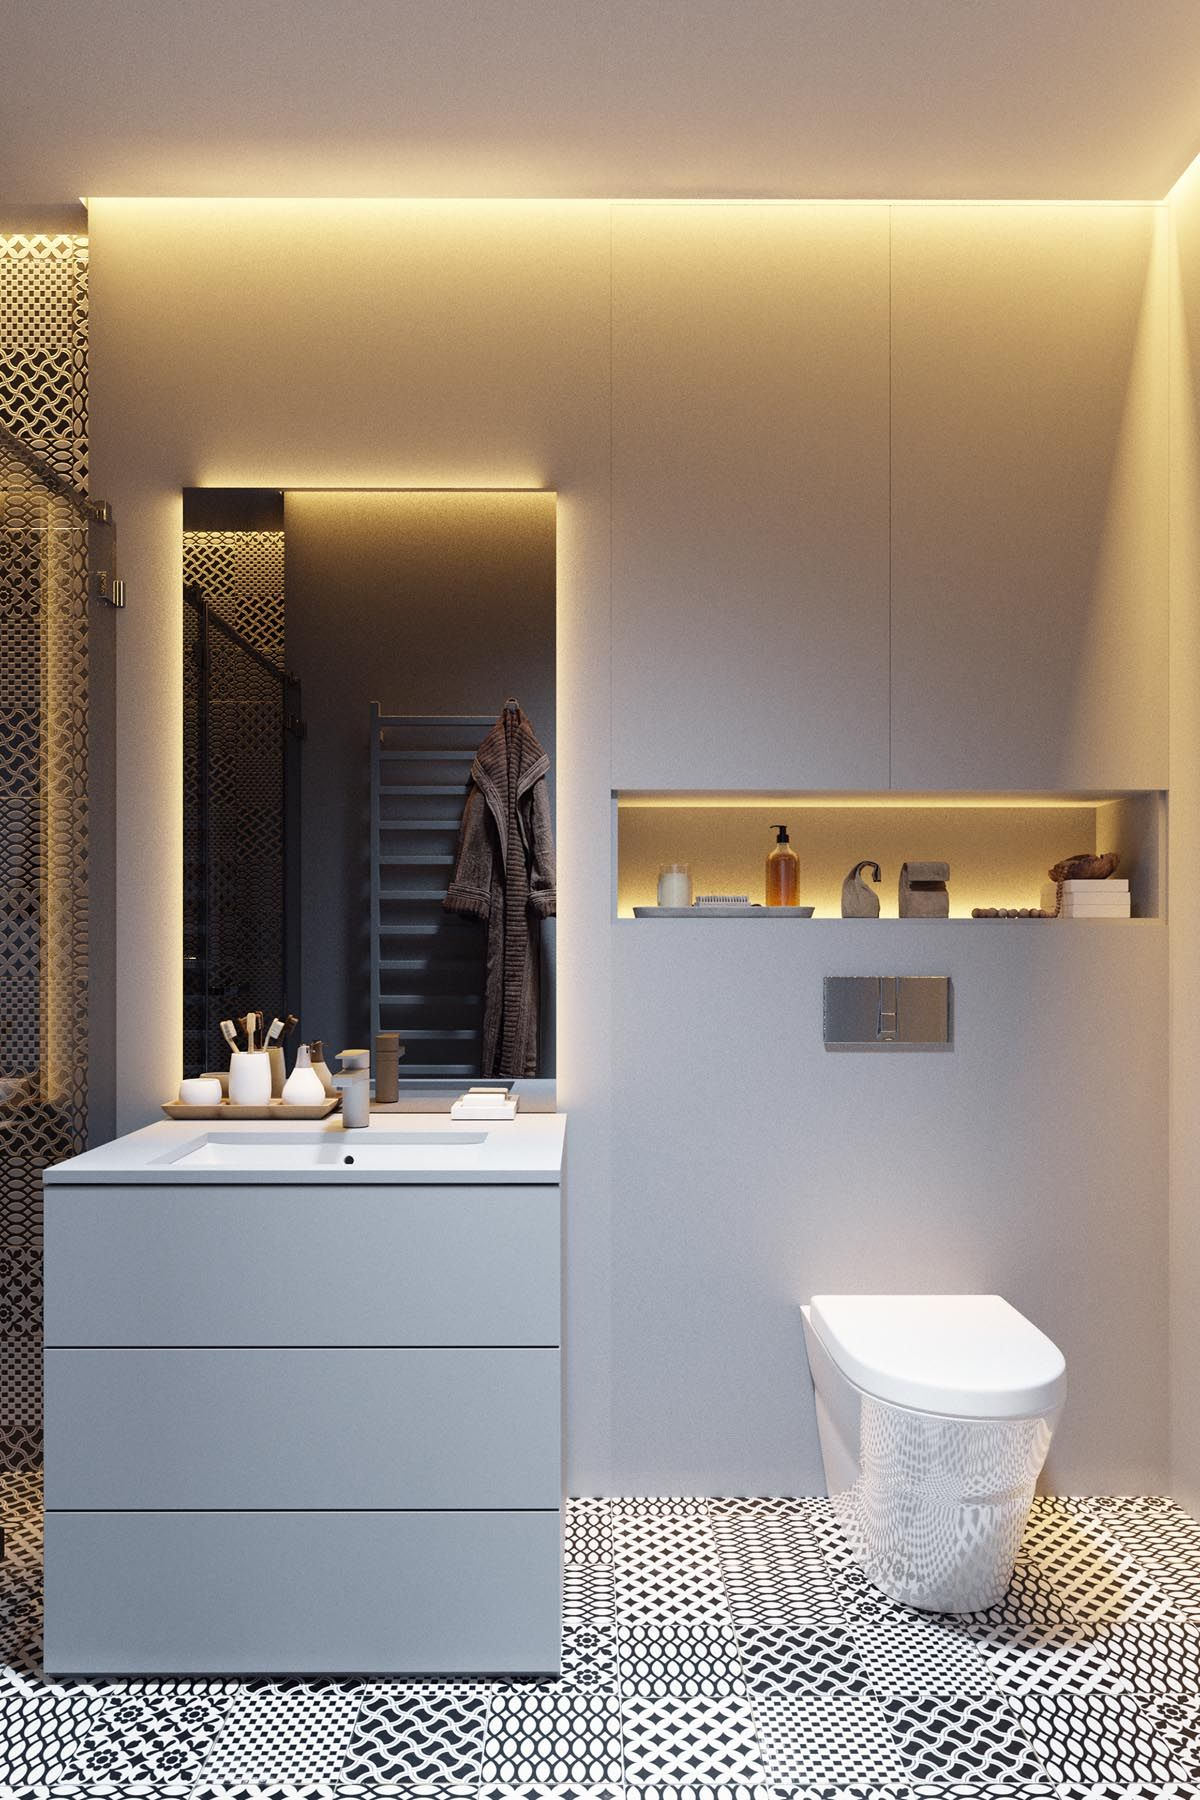 Dark Grey Home Decor With Warm LED